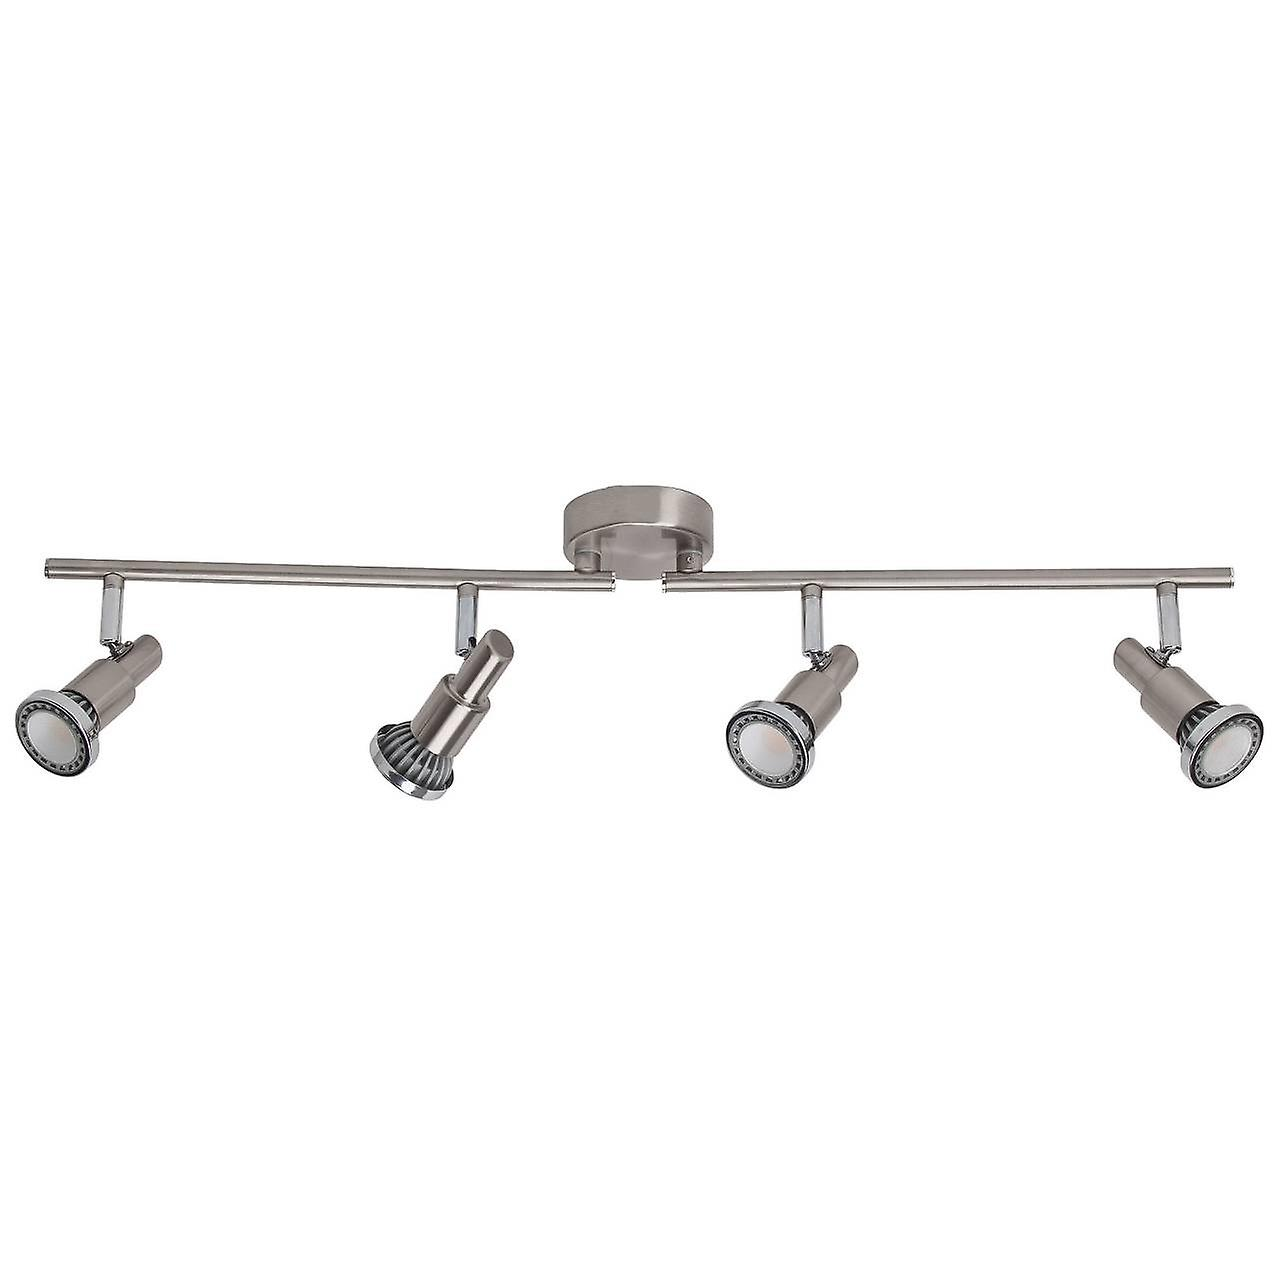 BRILLIANT Lampe Ryan LED Spotrohr 4flg eisen/chrom   4x LED-PAR51, GU10, 5W LED-Reflektorlampen inklusive, (380lm, 3000K)   Skala A++ bis E   Arme drehbar / Köpfe schwenkbar